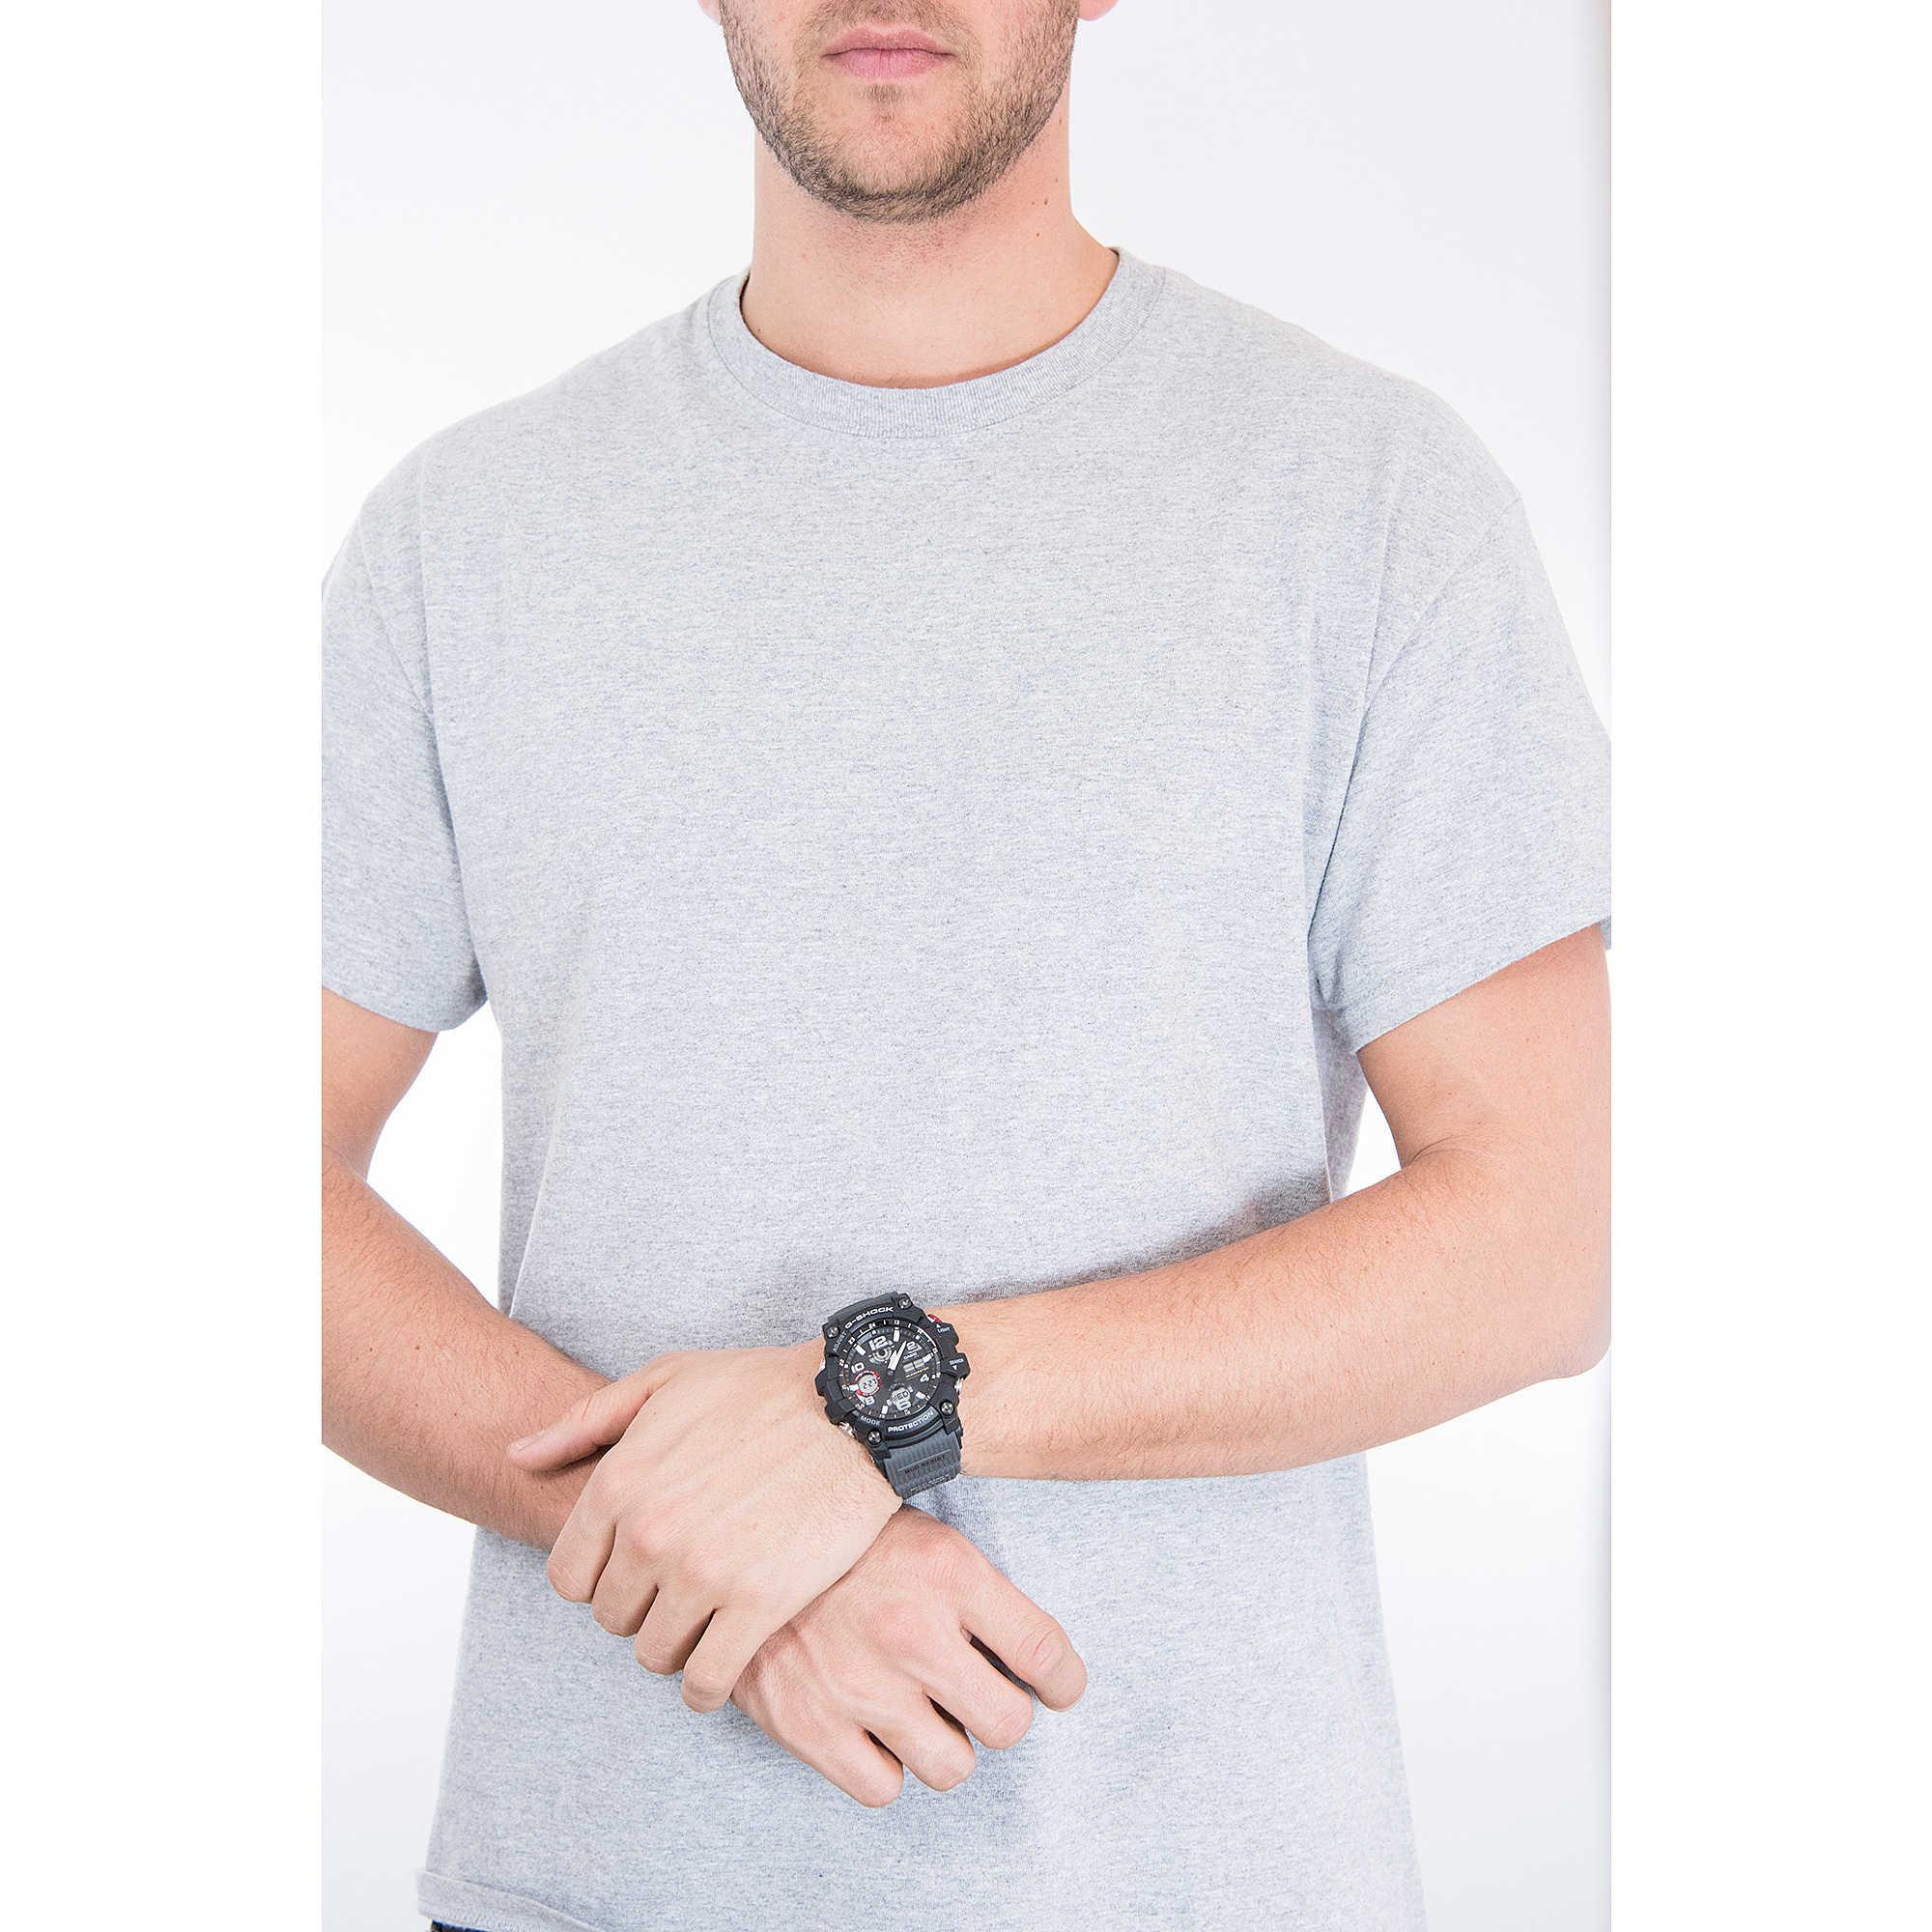 79ea9cf56e139 watch digital man Casio G Shock Premium GWG-100-1A8ER digitals Casio